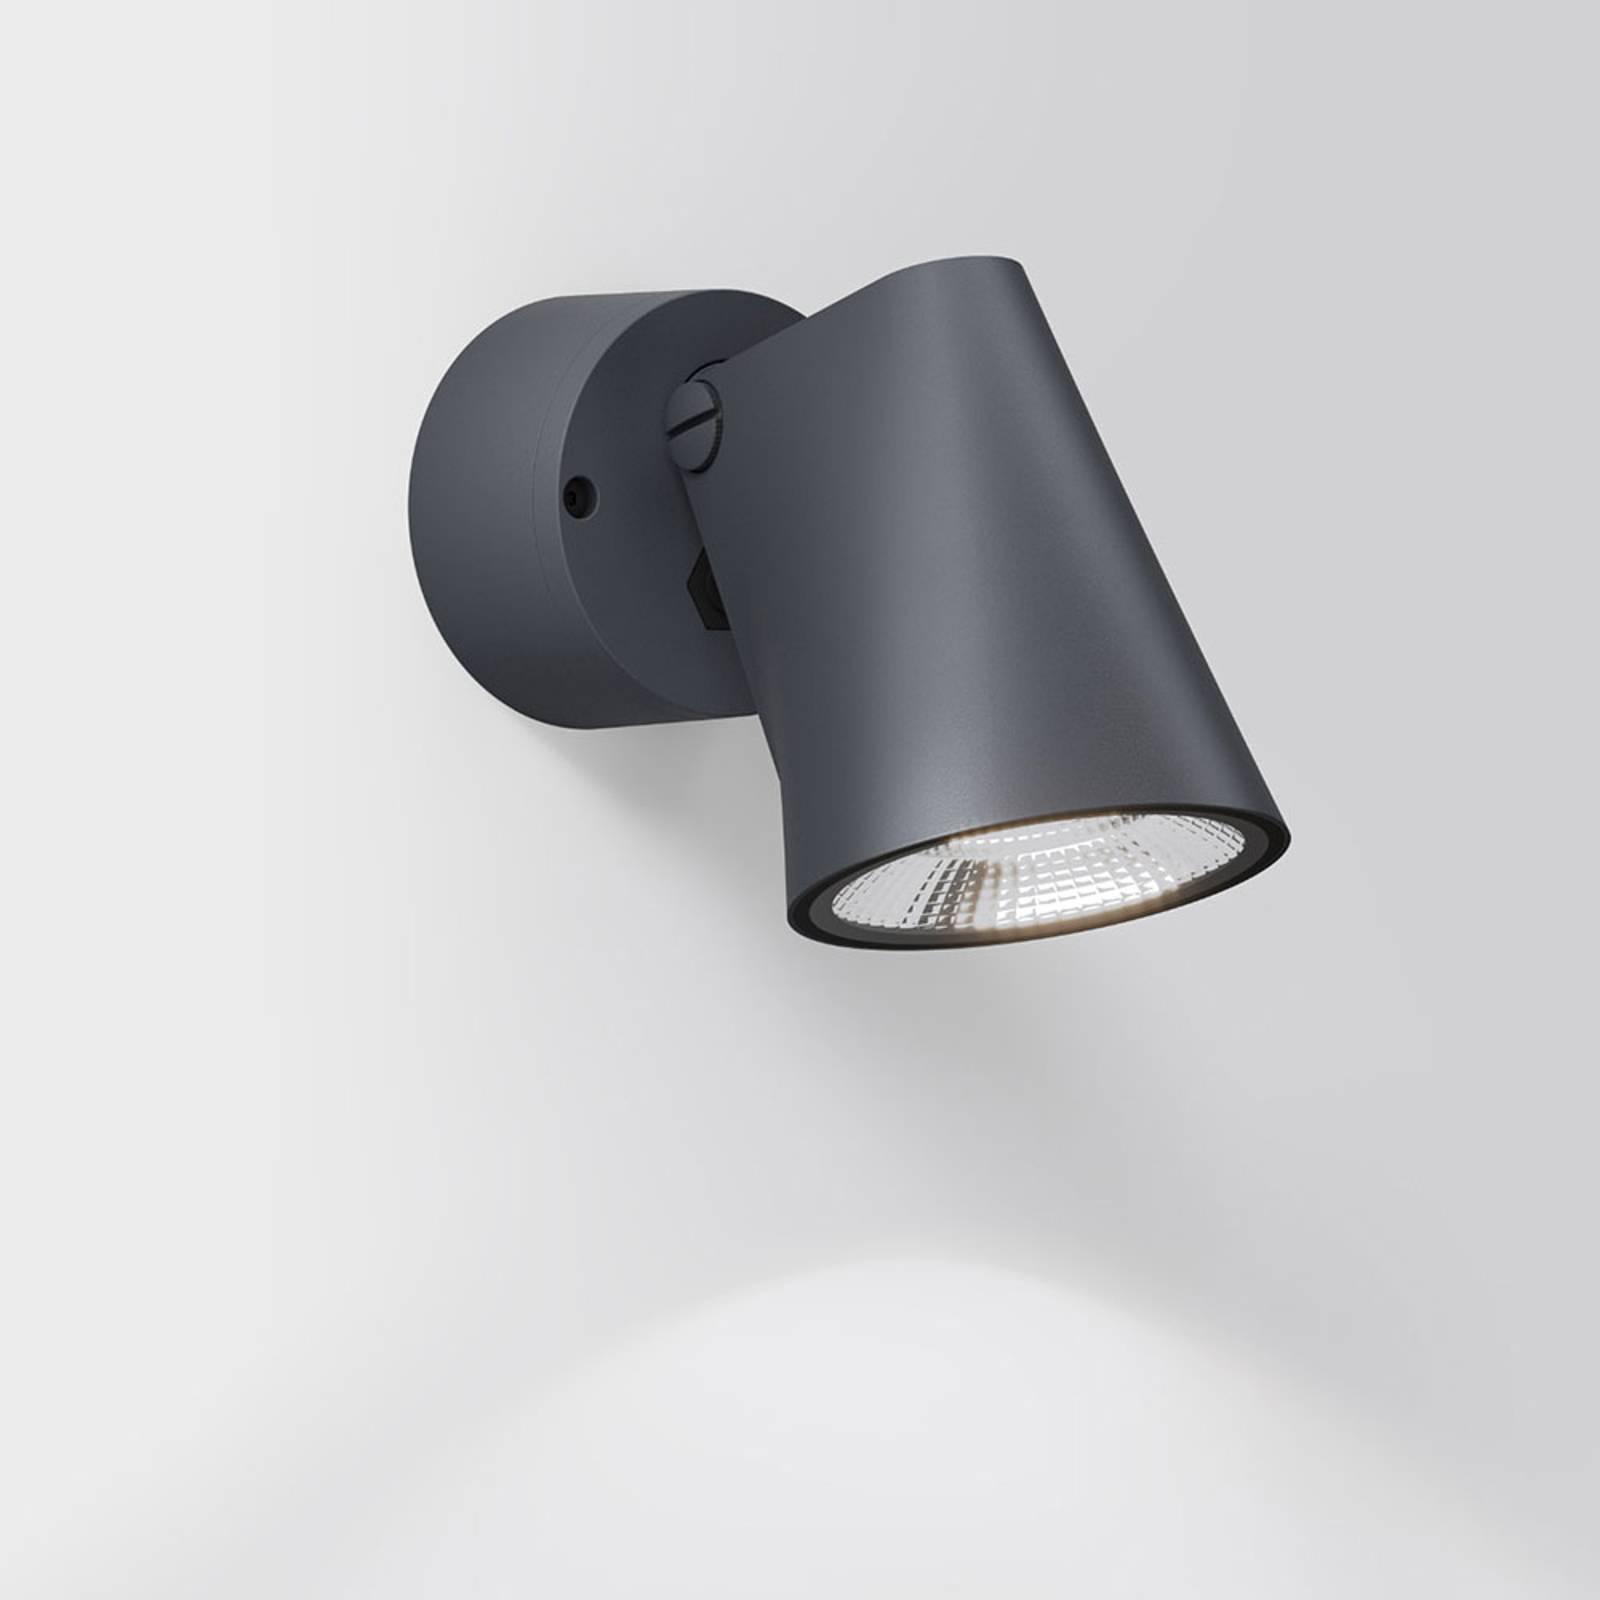 IP44.de Stic LED-Außenwandleuchte, anthrazit